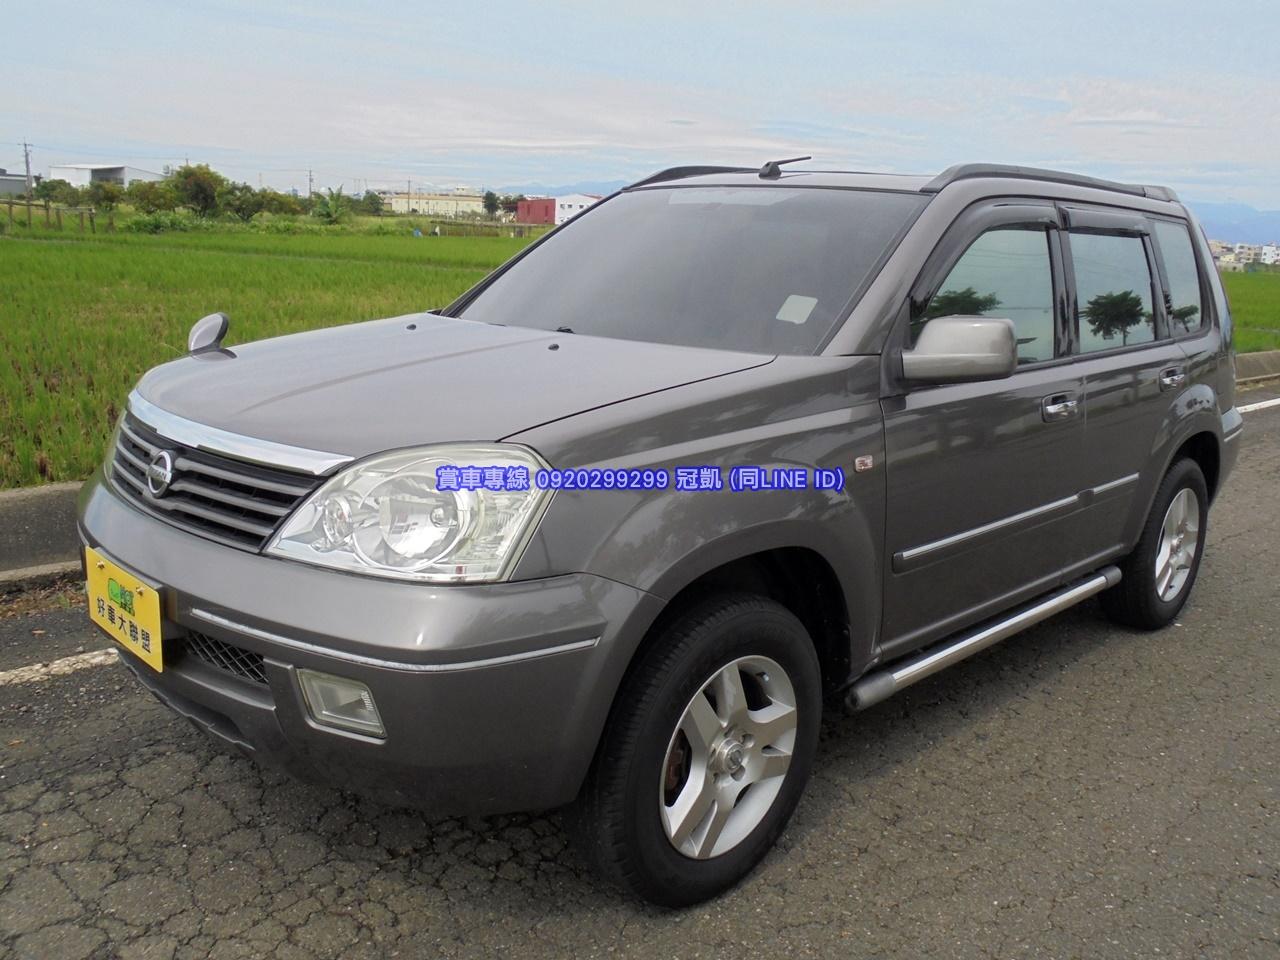 2005 Nissan 日產 X-trail